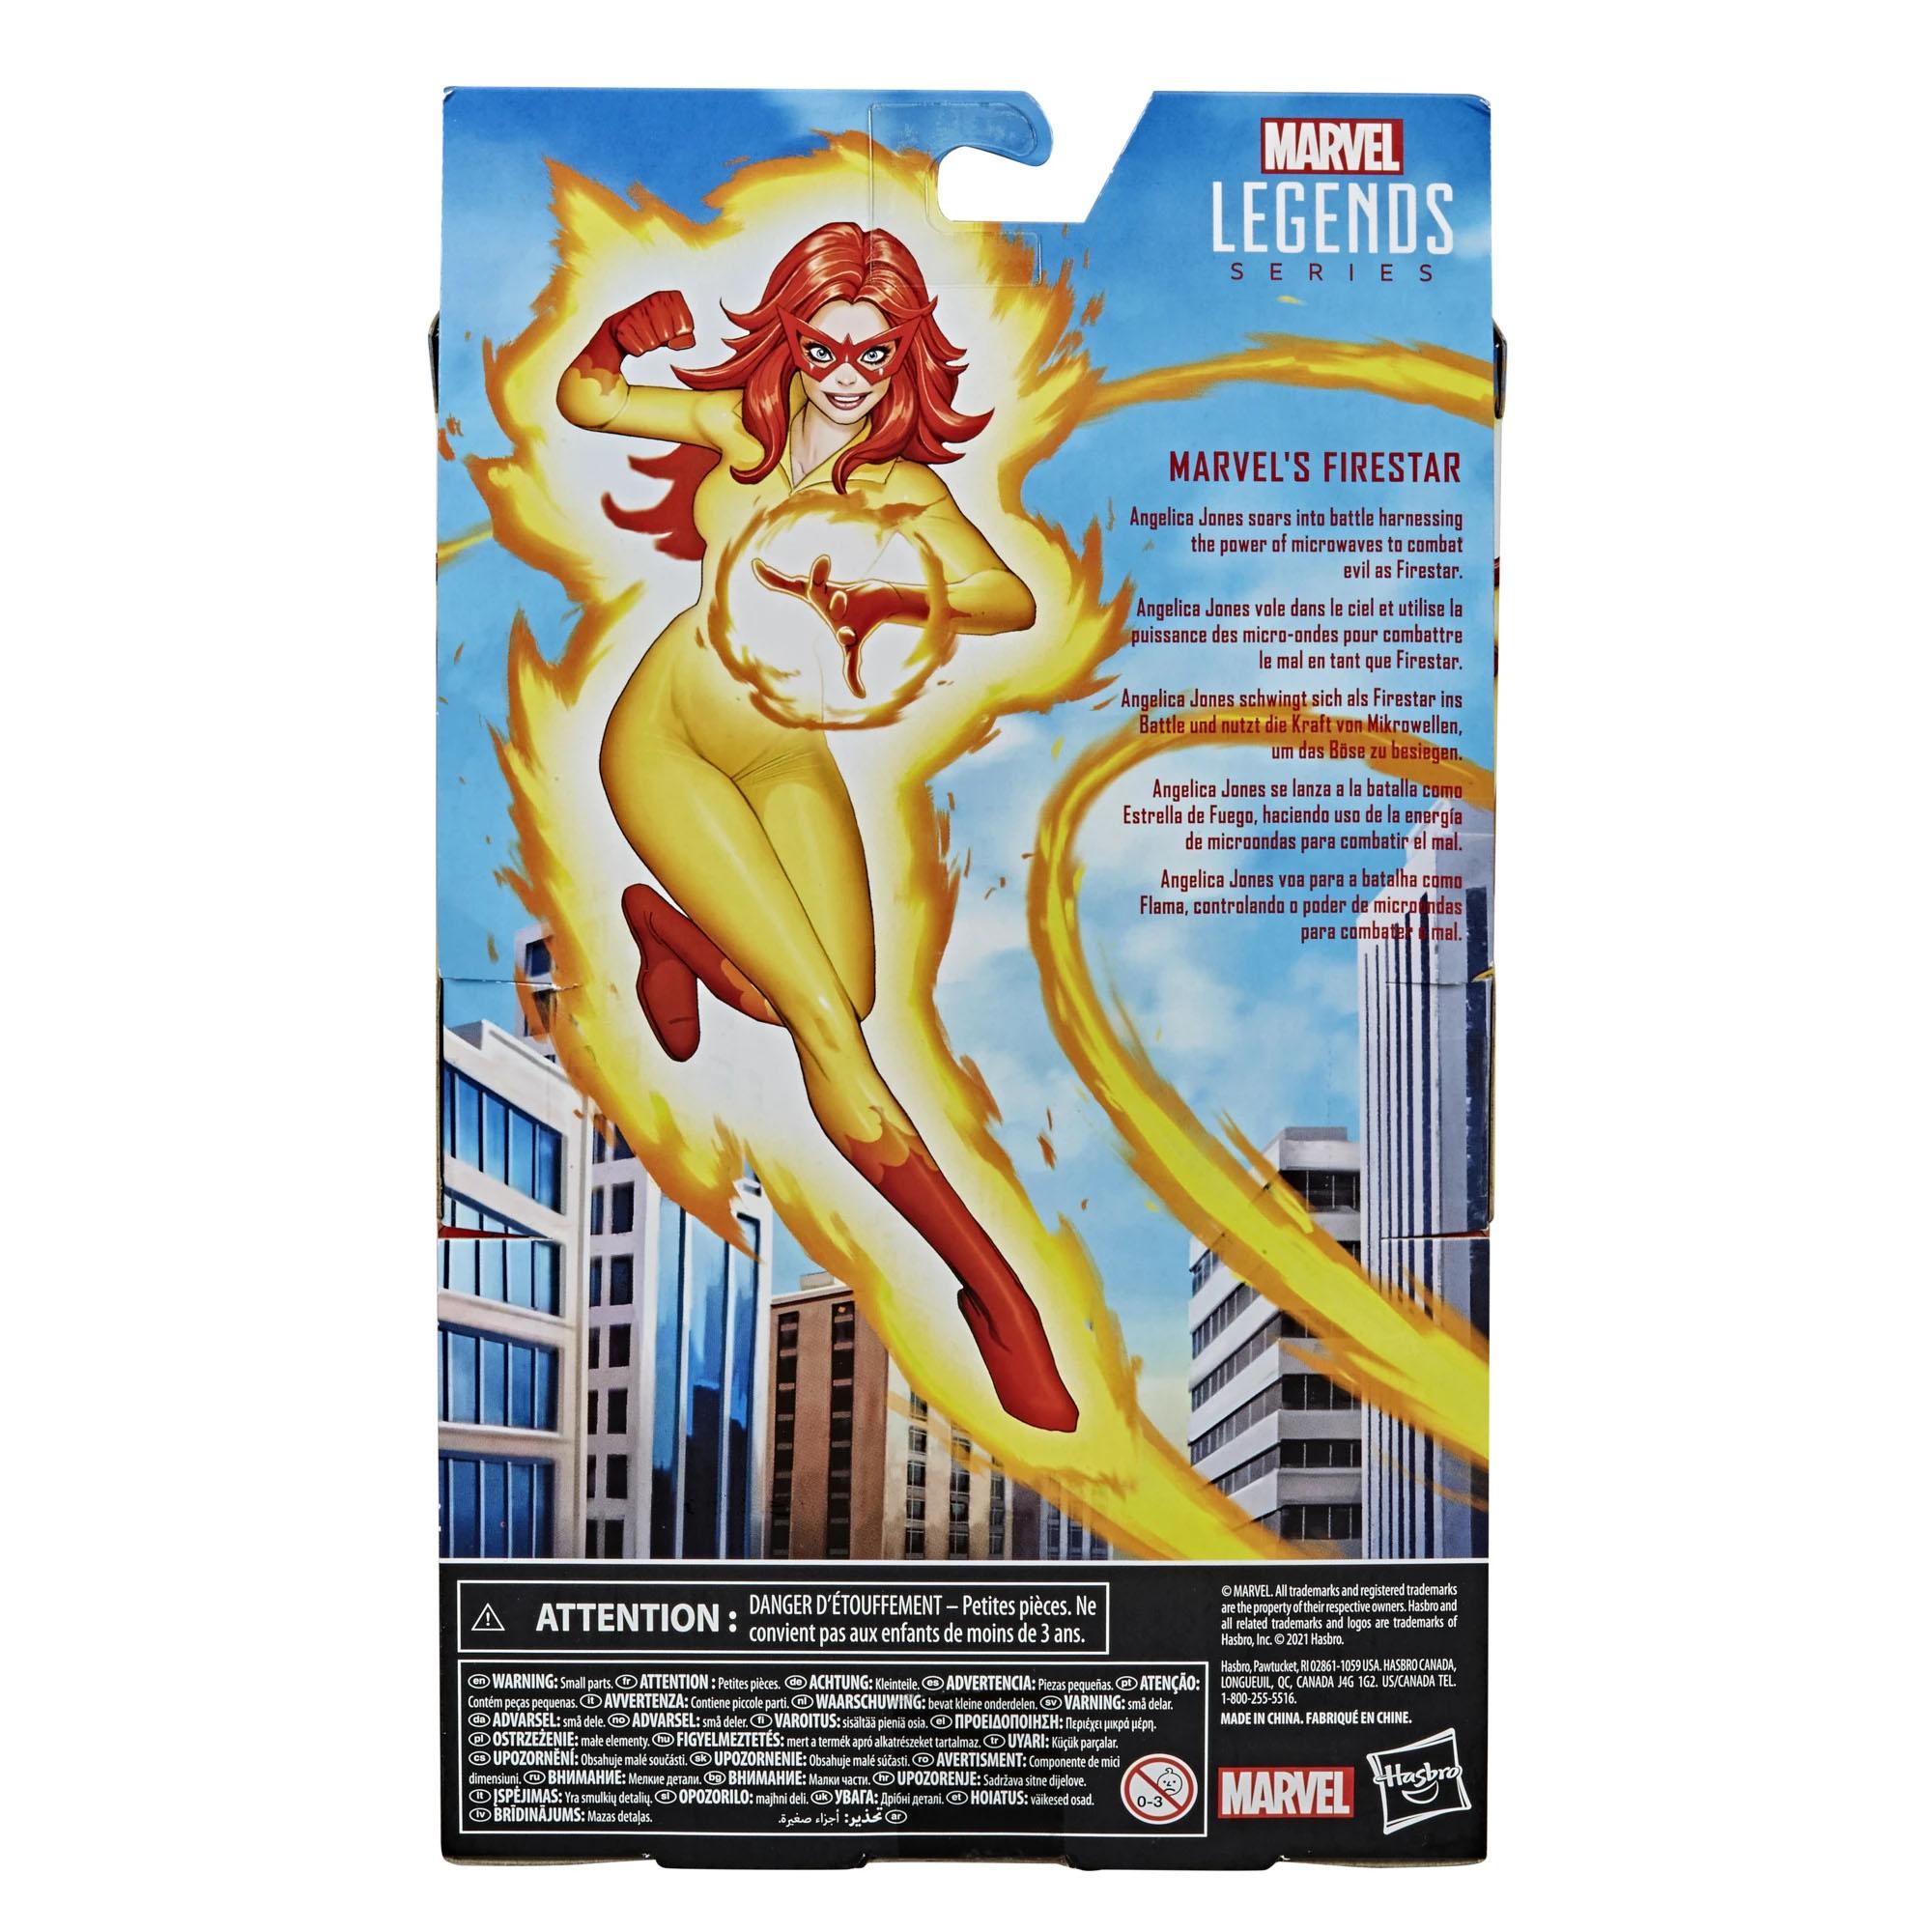 Marvel-Legends-Firestar-002